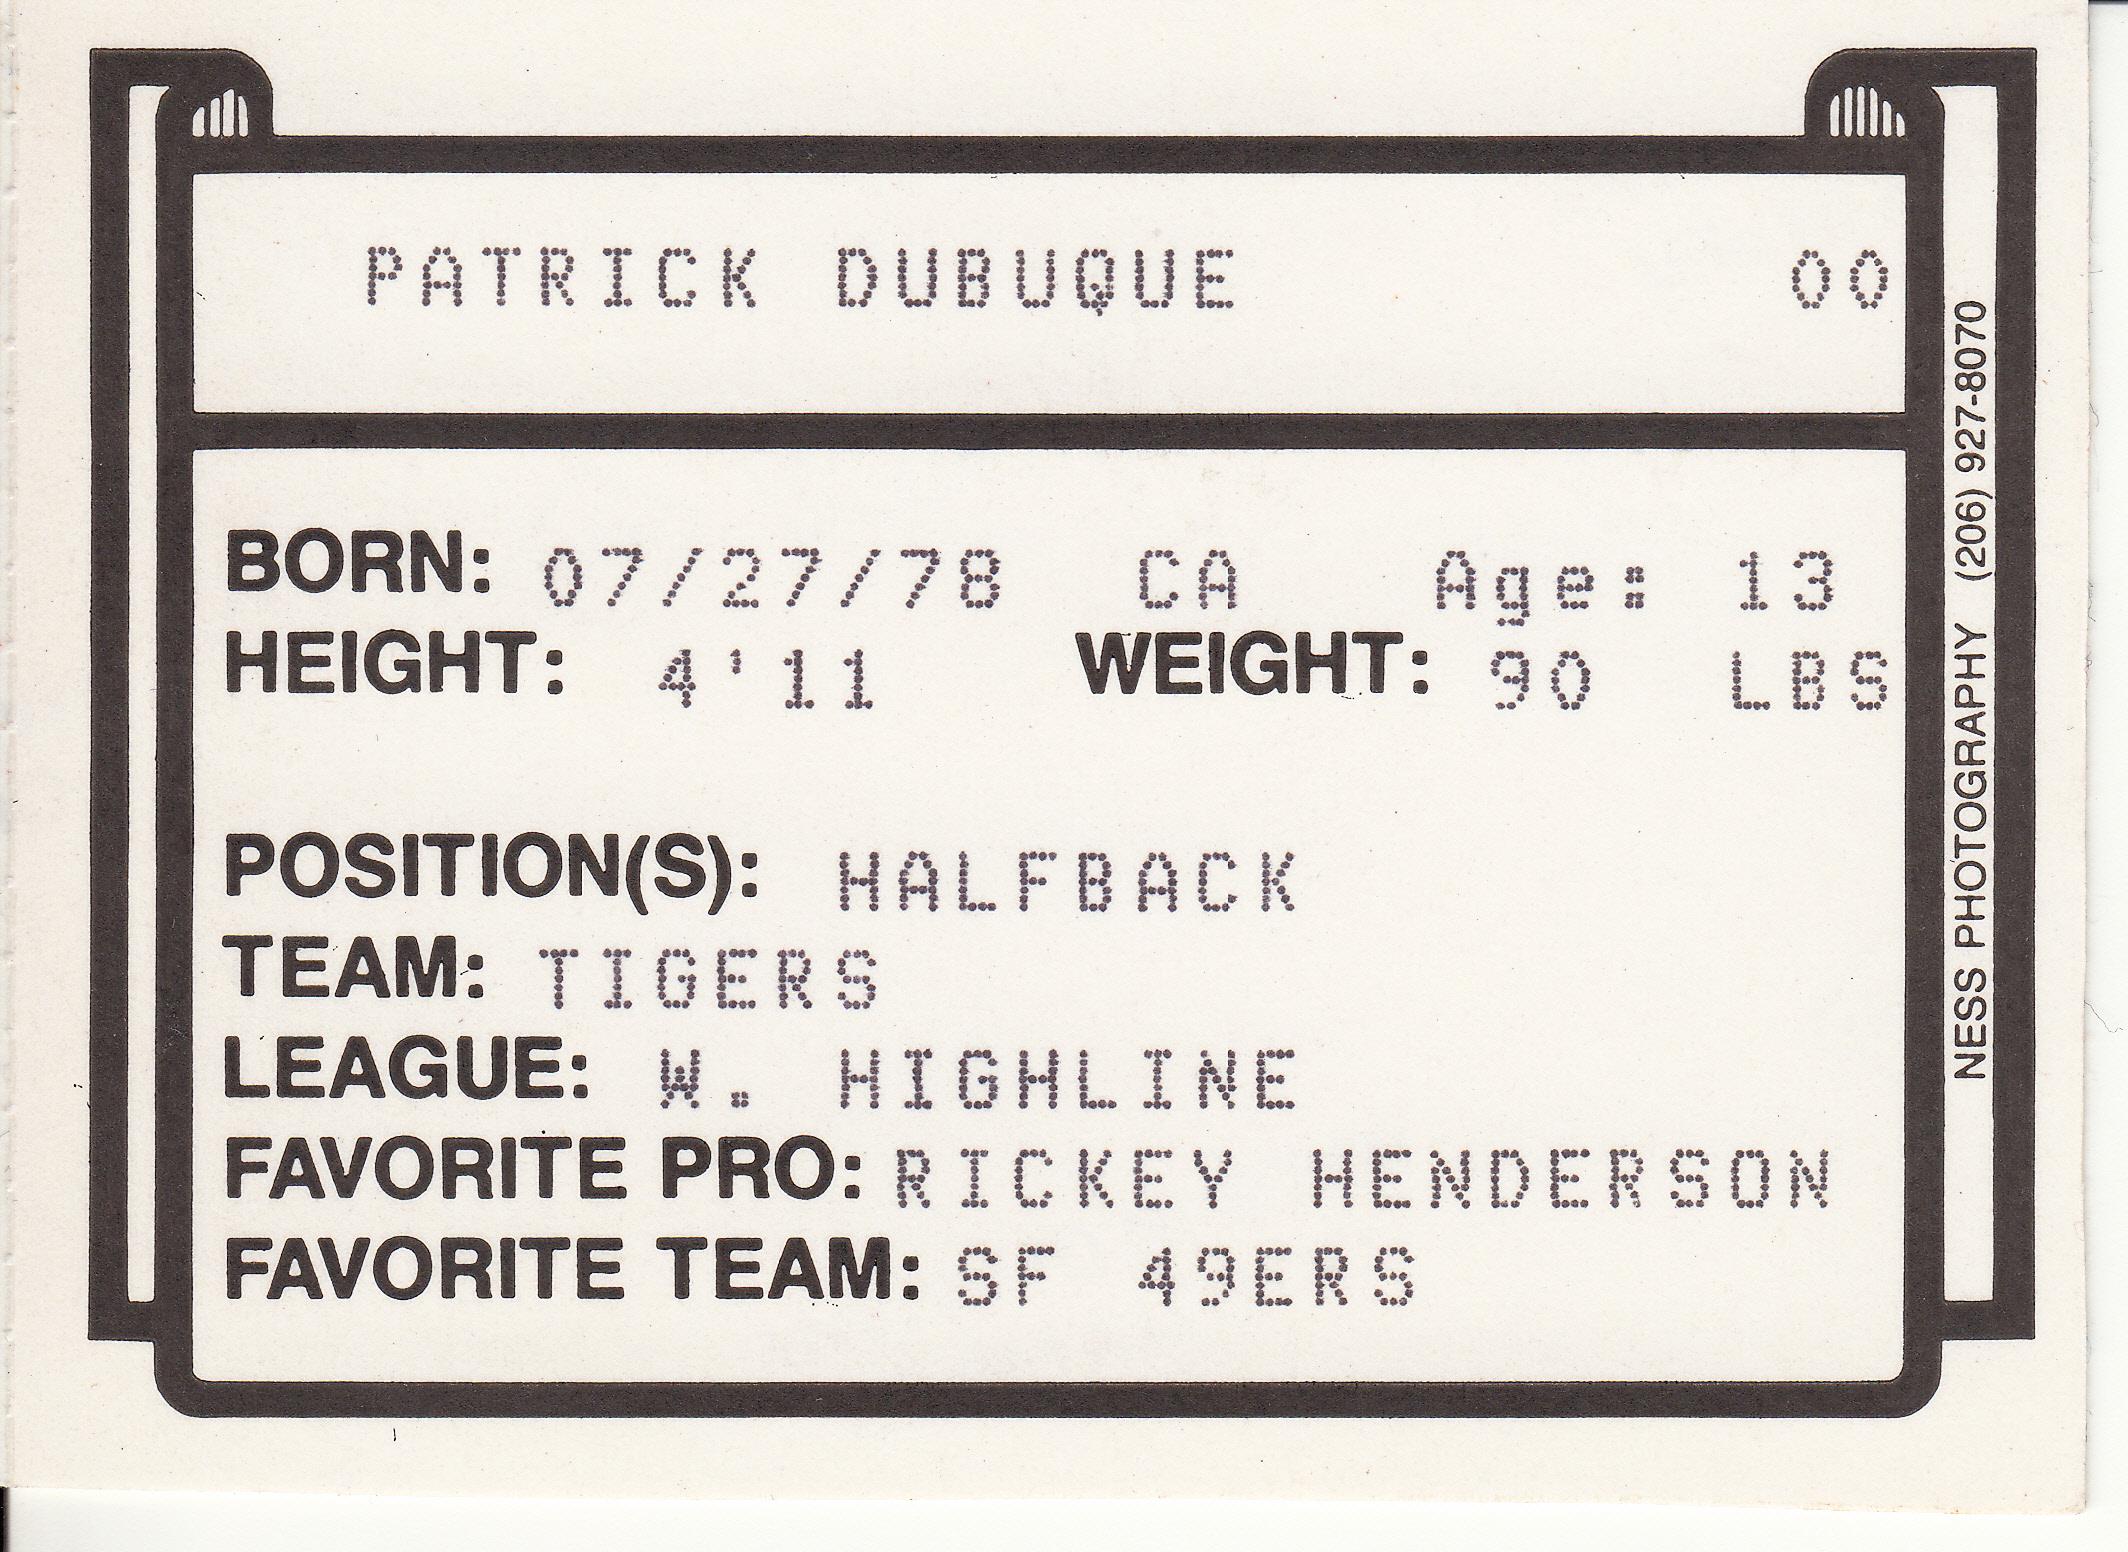 1991 Patrick2